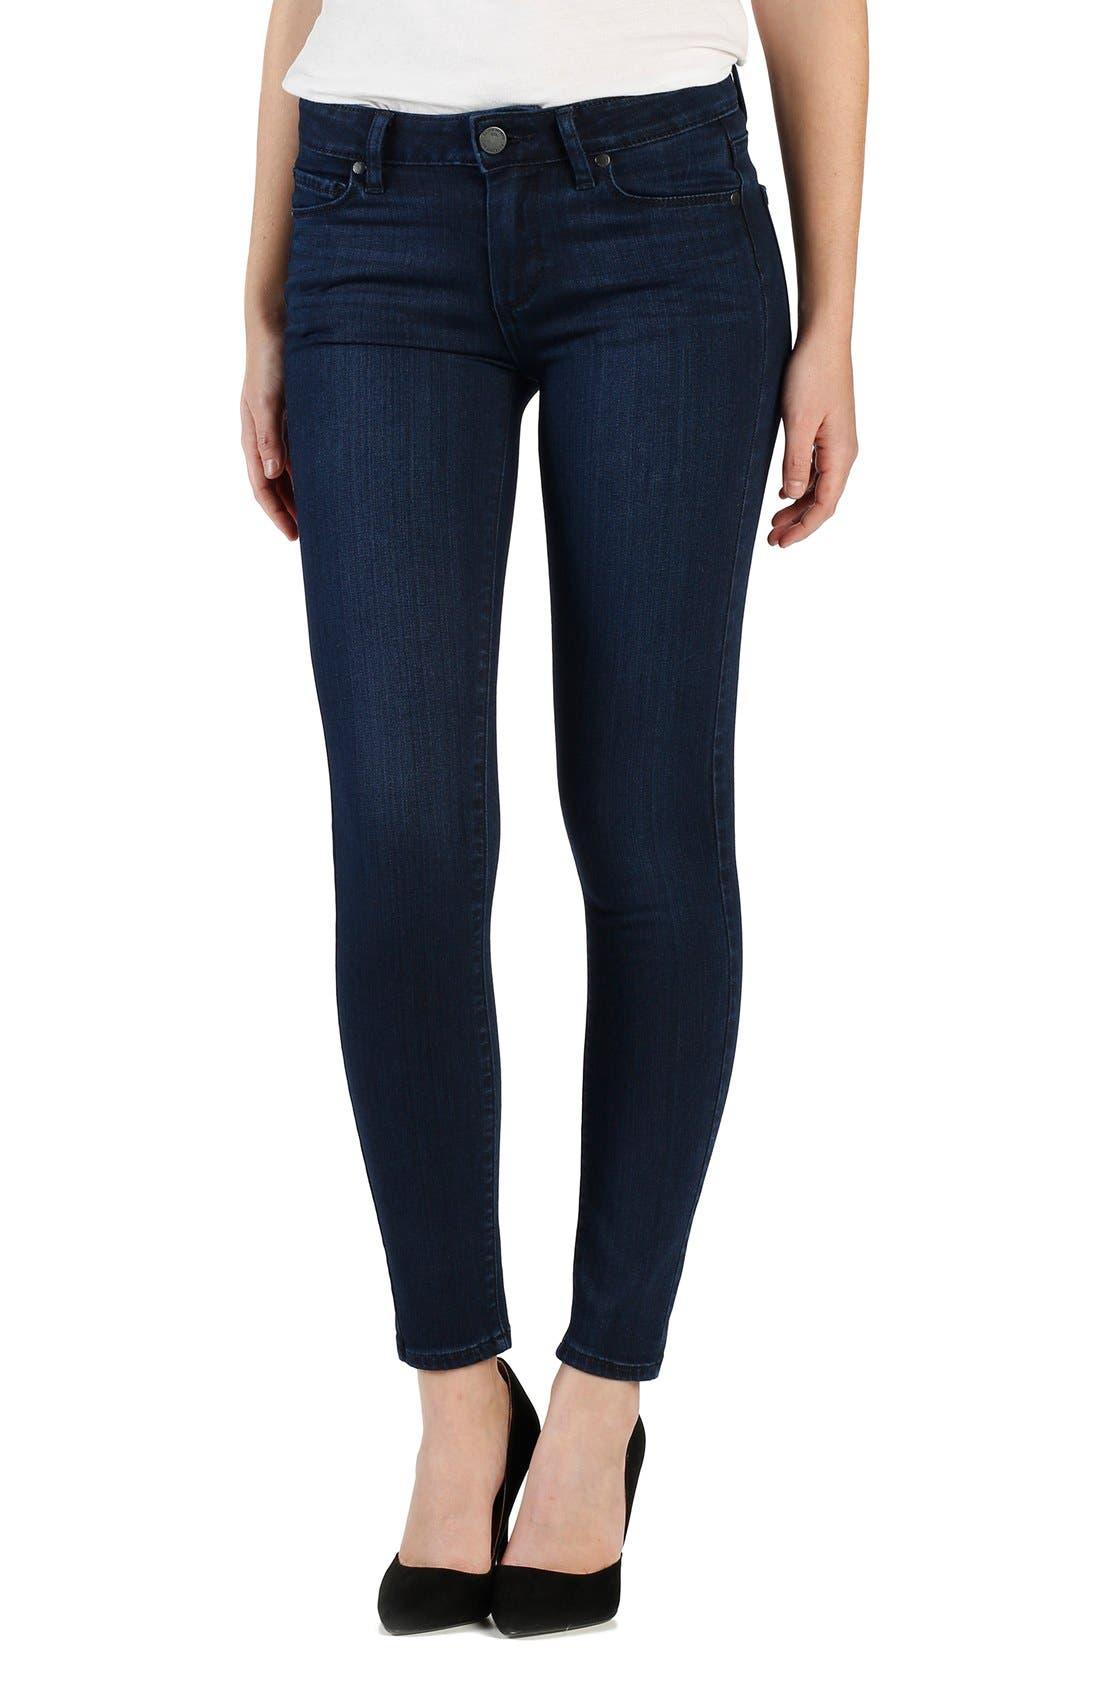 Alternate Image 1 Selected - PAIGE 'Transcend - Verdugo' Ultra Skinny AnkleJeans (Holly)